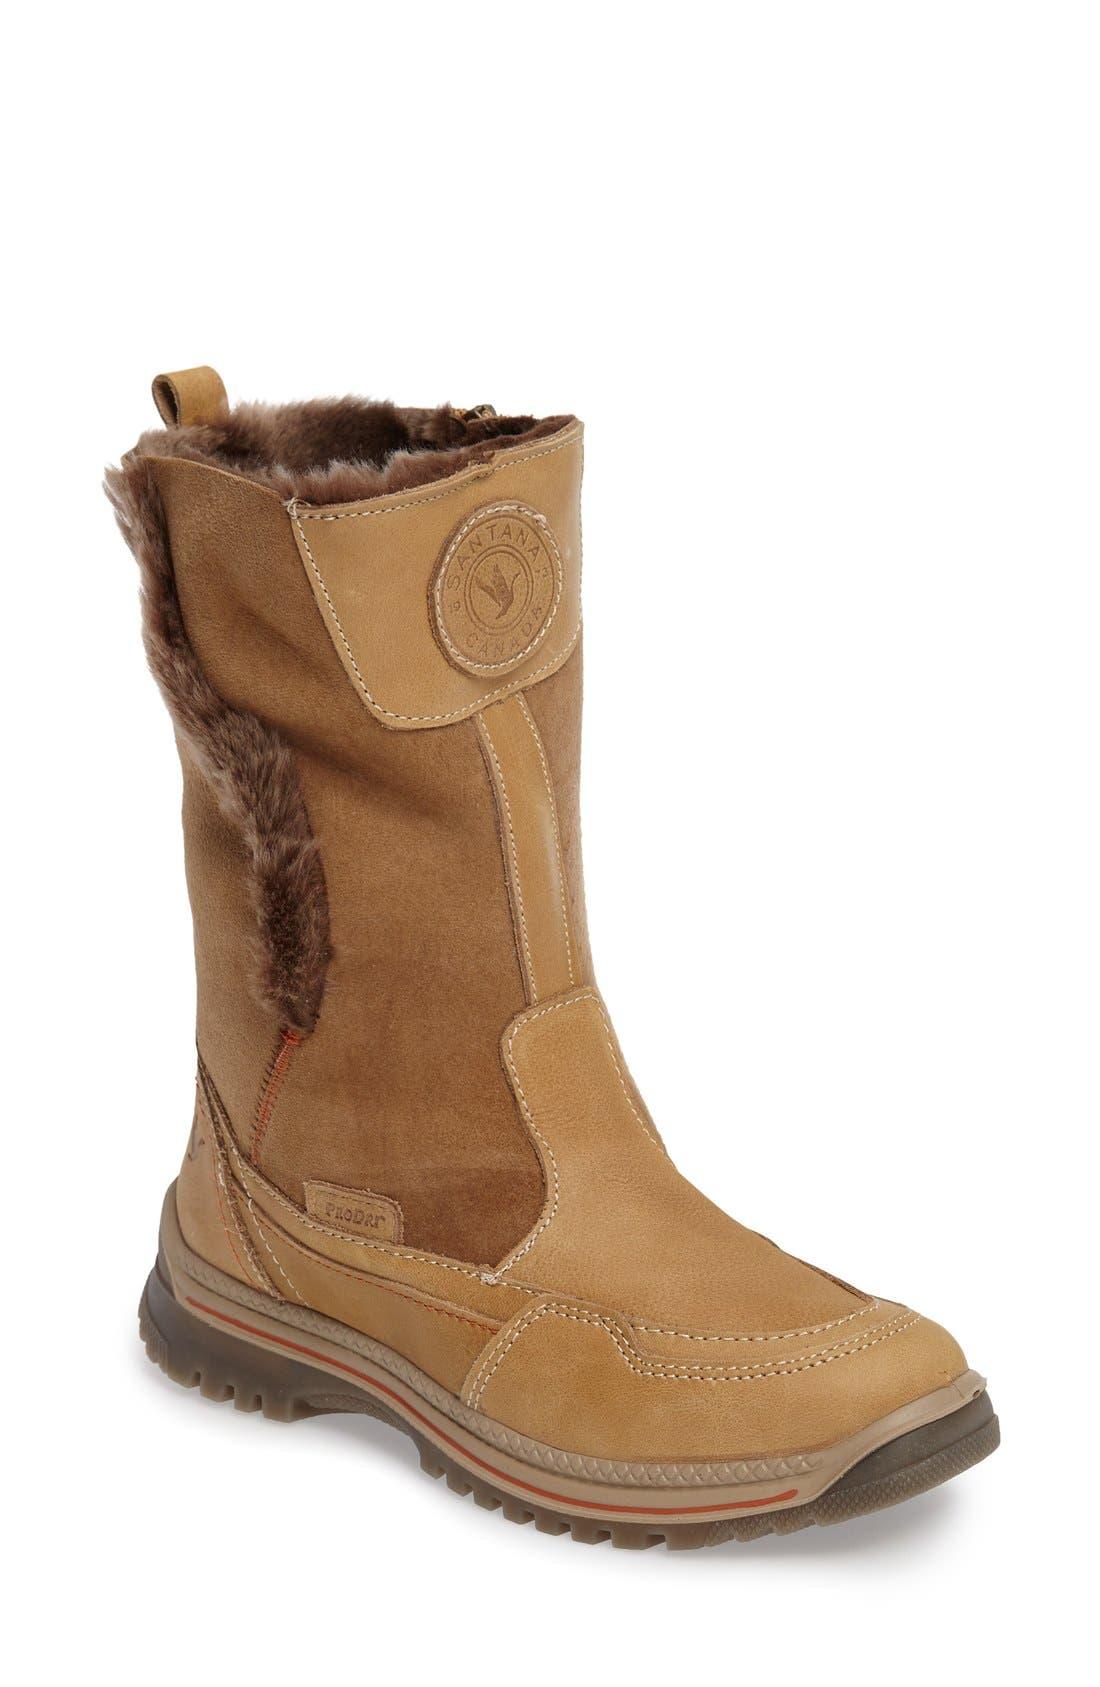 Alternate Image 1 Selected - Santana Canada Seraphine Genuine Shearling Waterproof Winter Boot (Women) (Wide Calf)